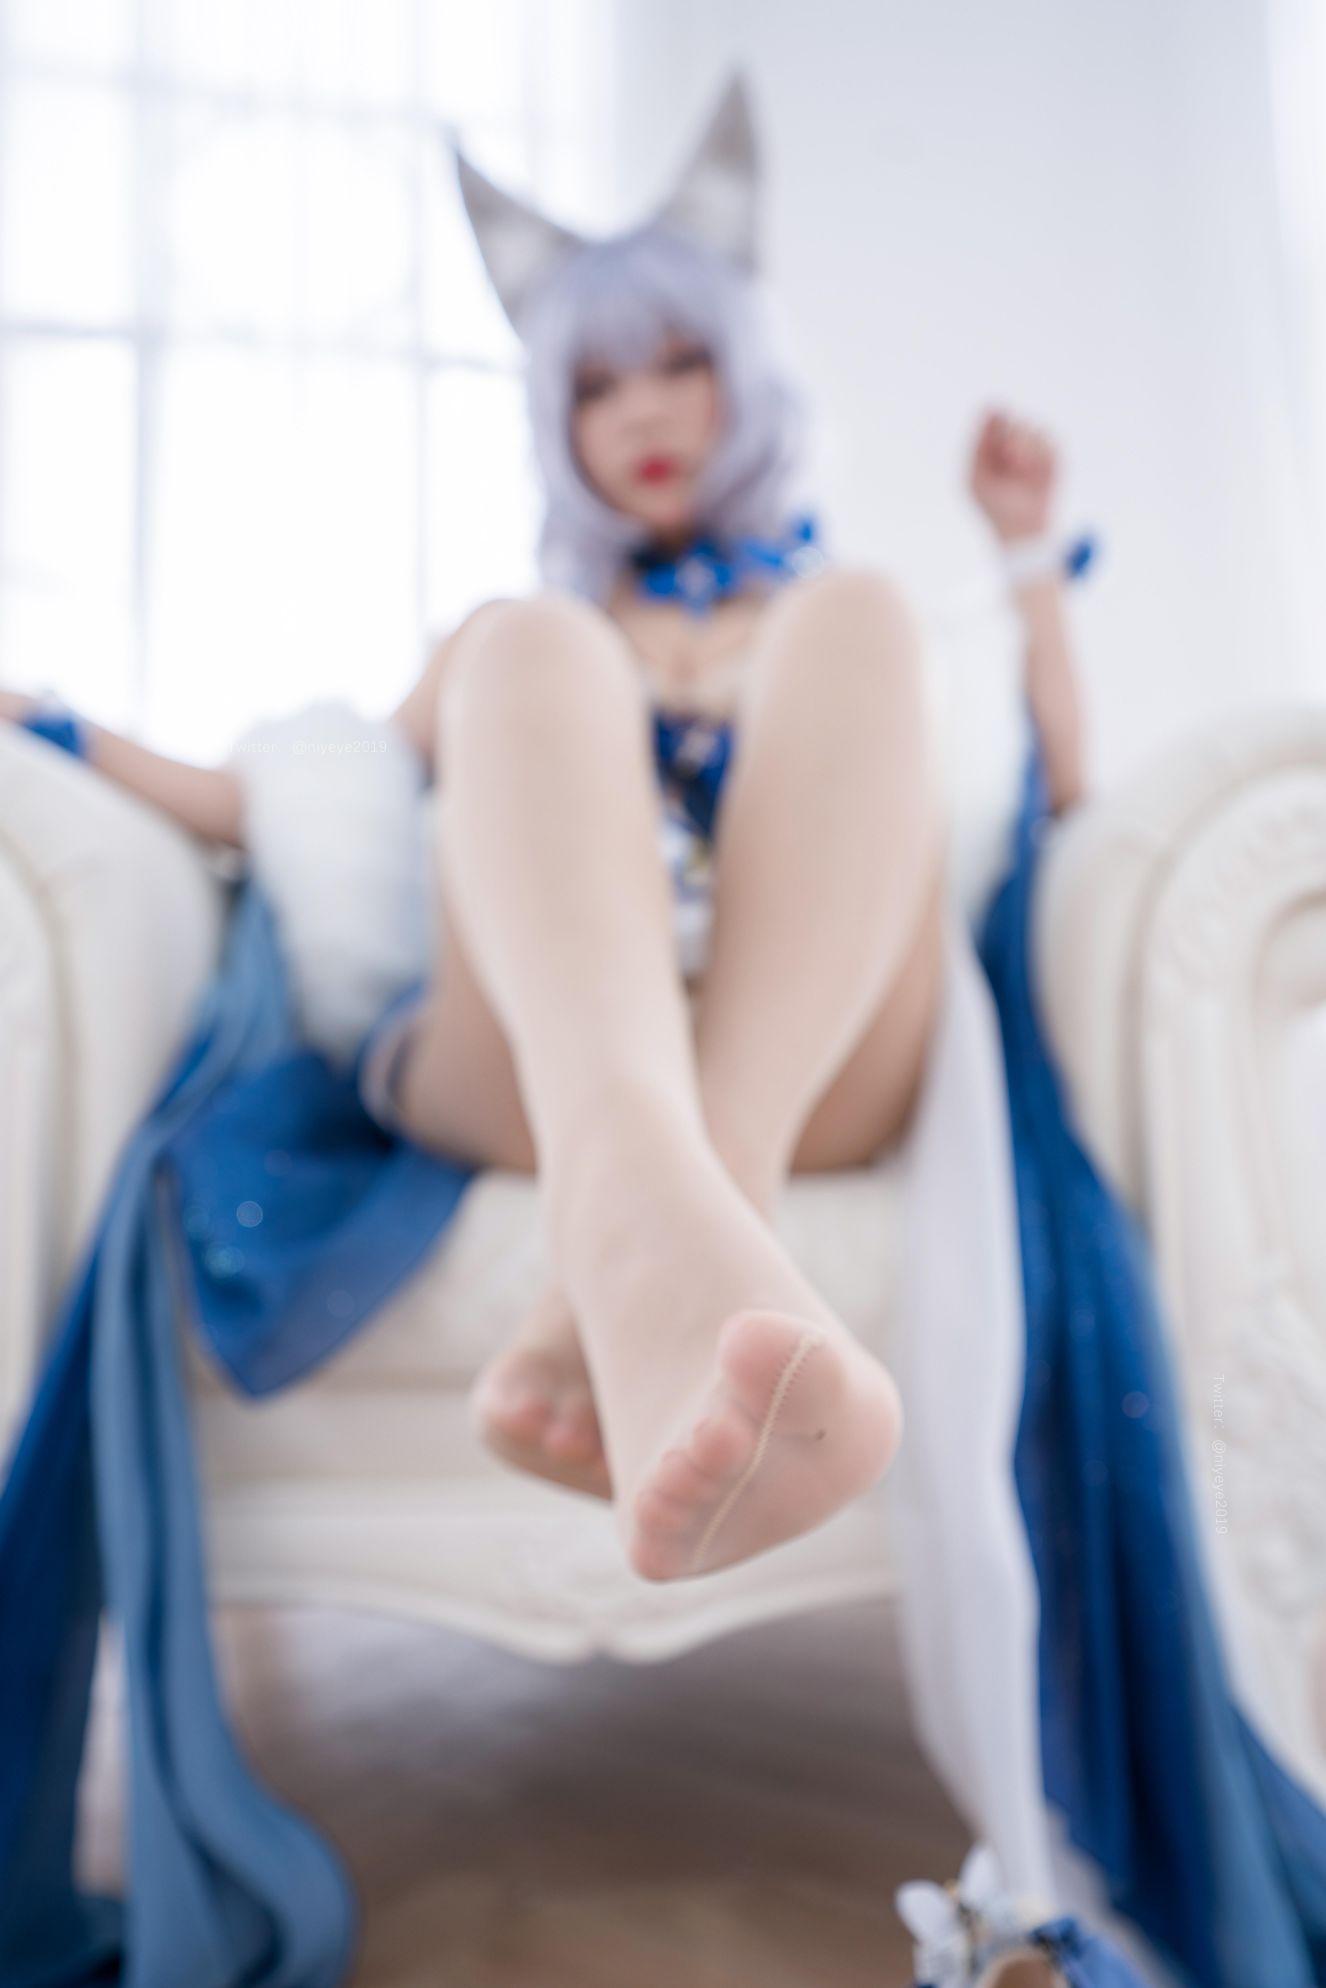 Azur Lane Shinano Cosplay by Bai Ye Extra Enticing Inviting 10